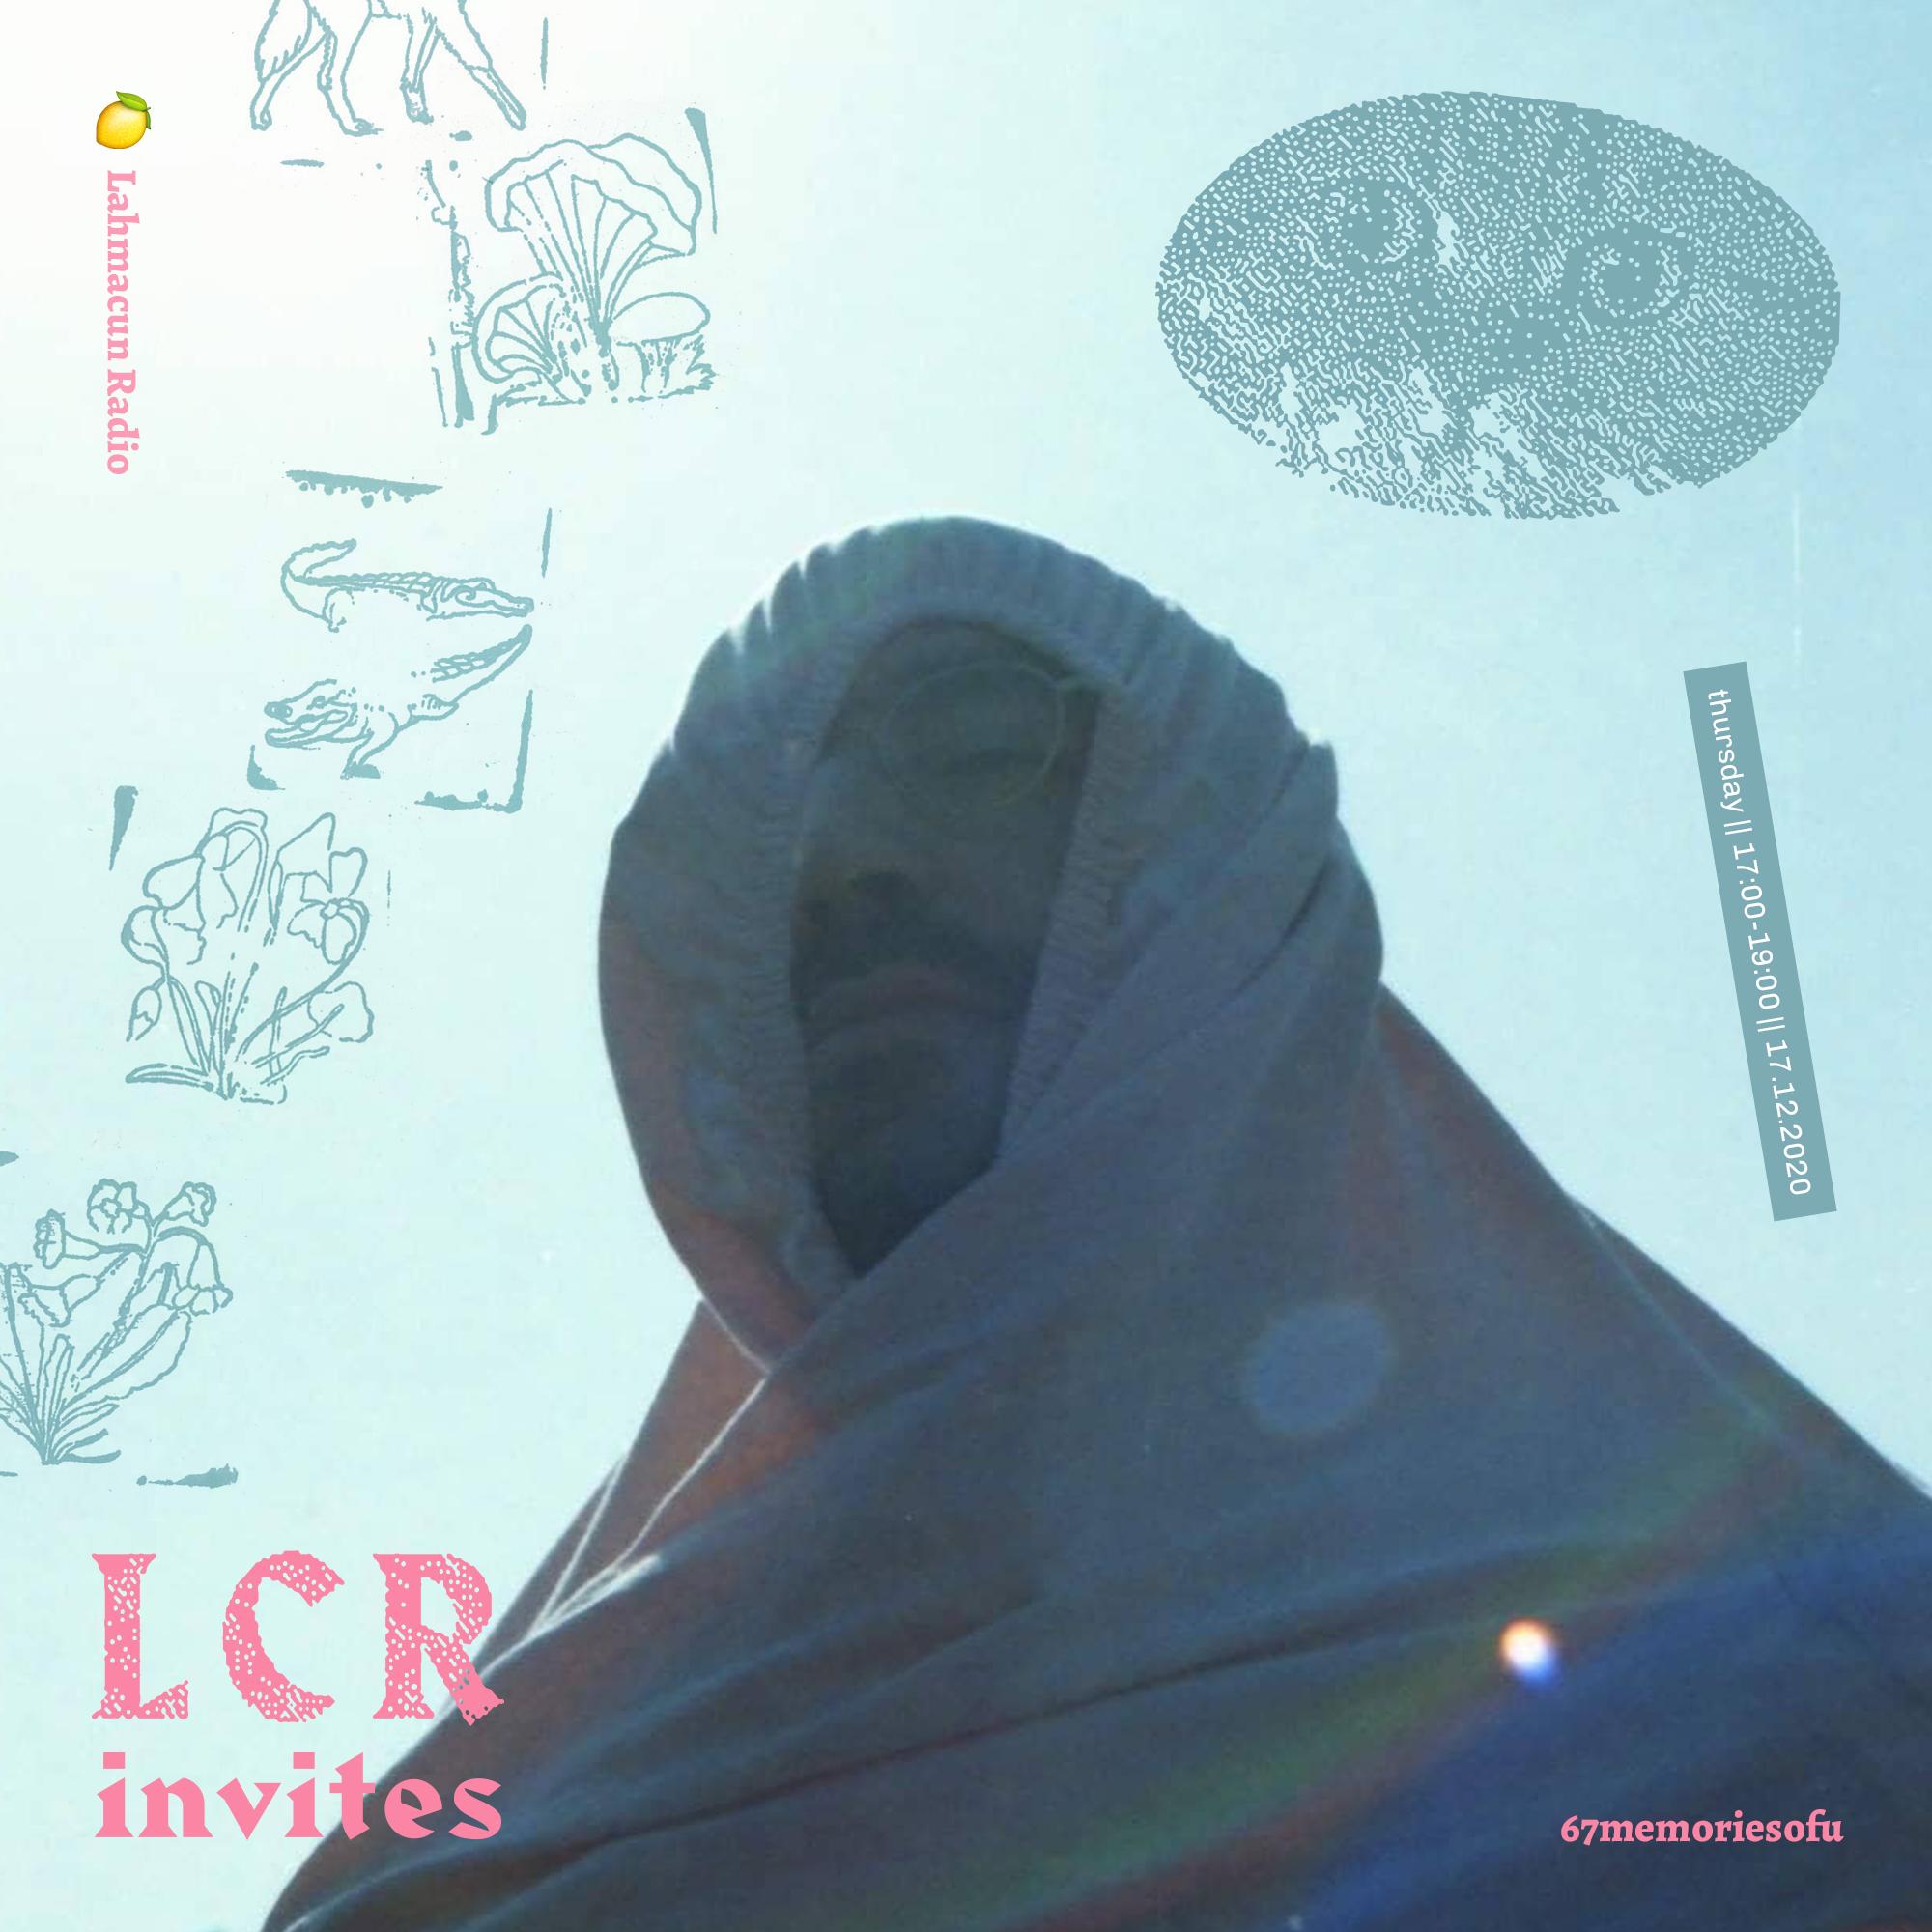 LCR INVITES /// 67memoriesofu  ~ Space 4 Sadness mix